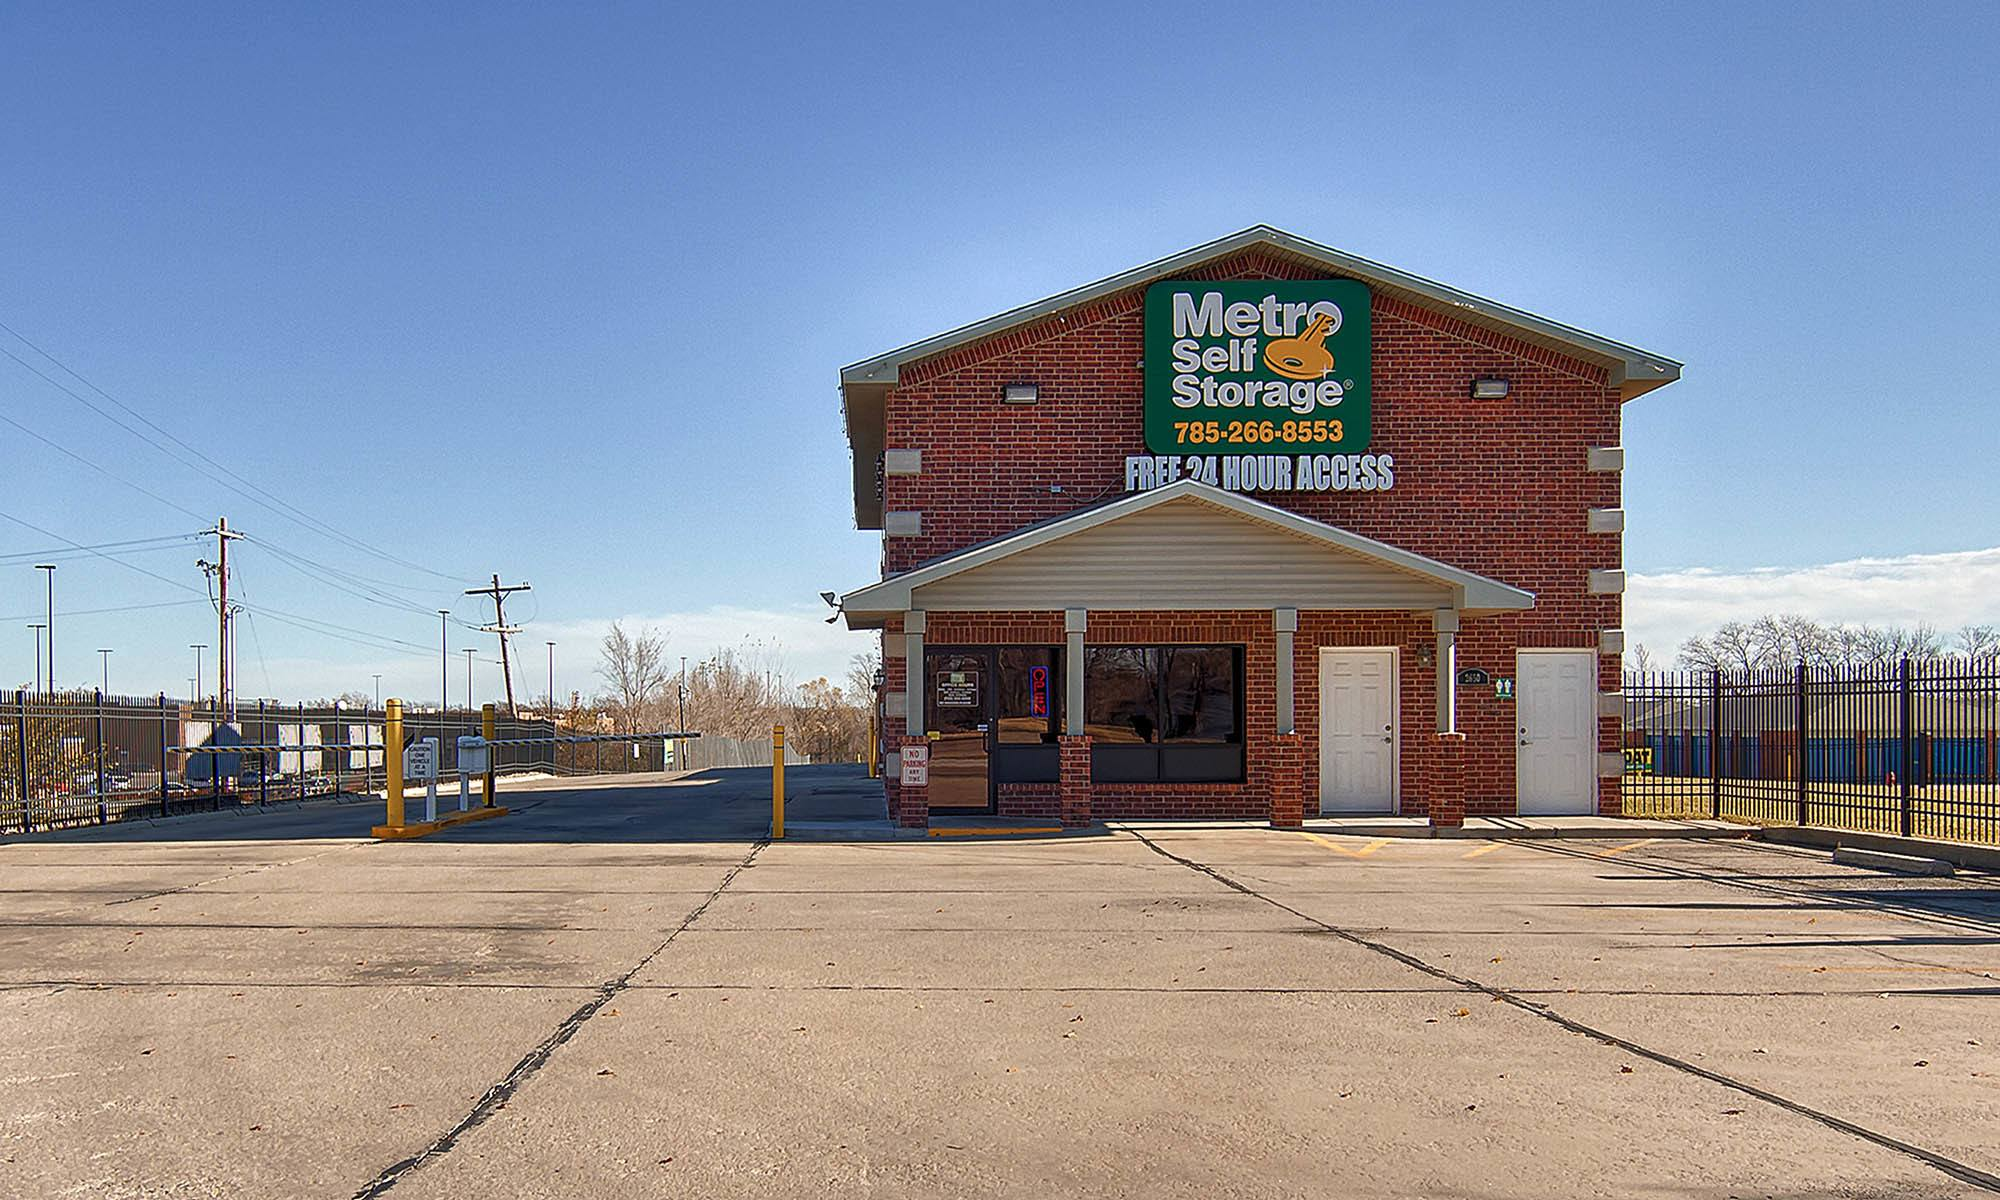 Metro Self Storage in Topeka, KS